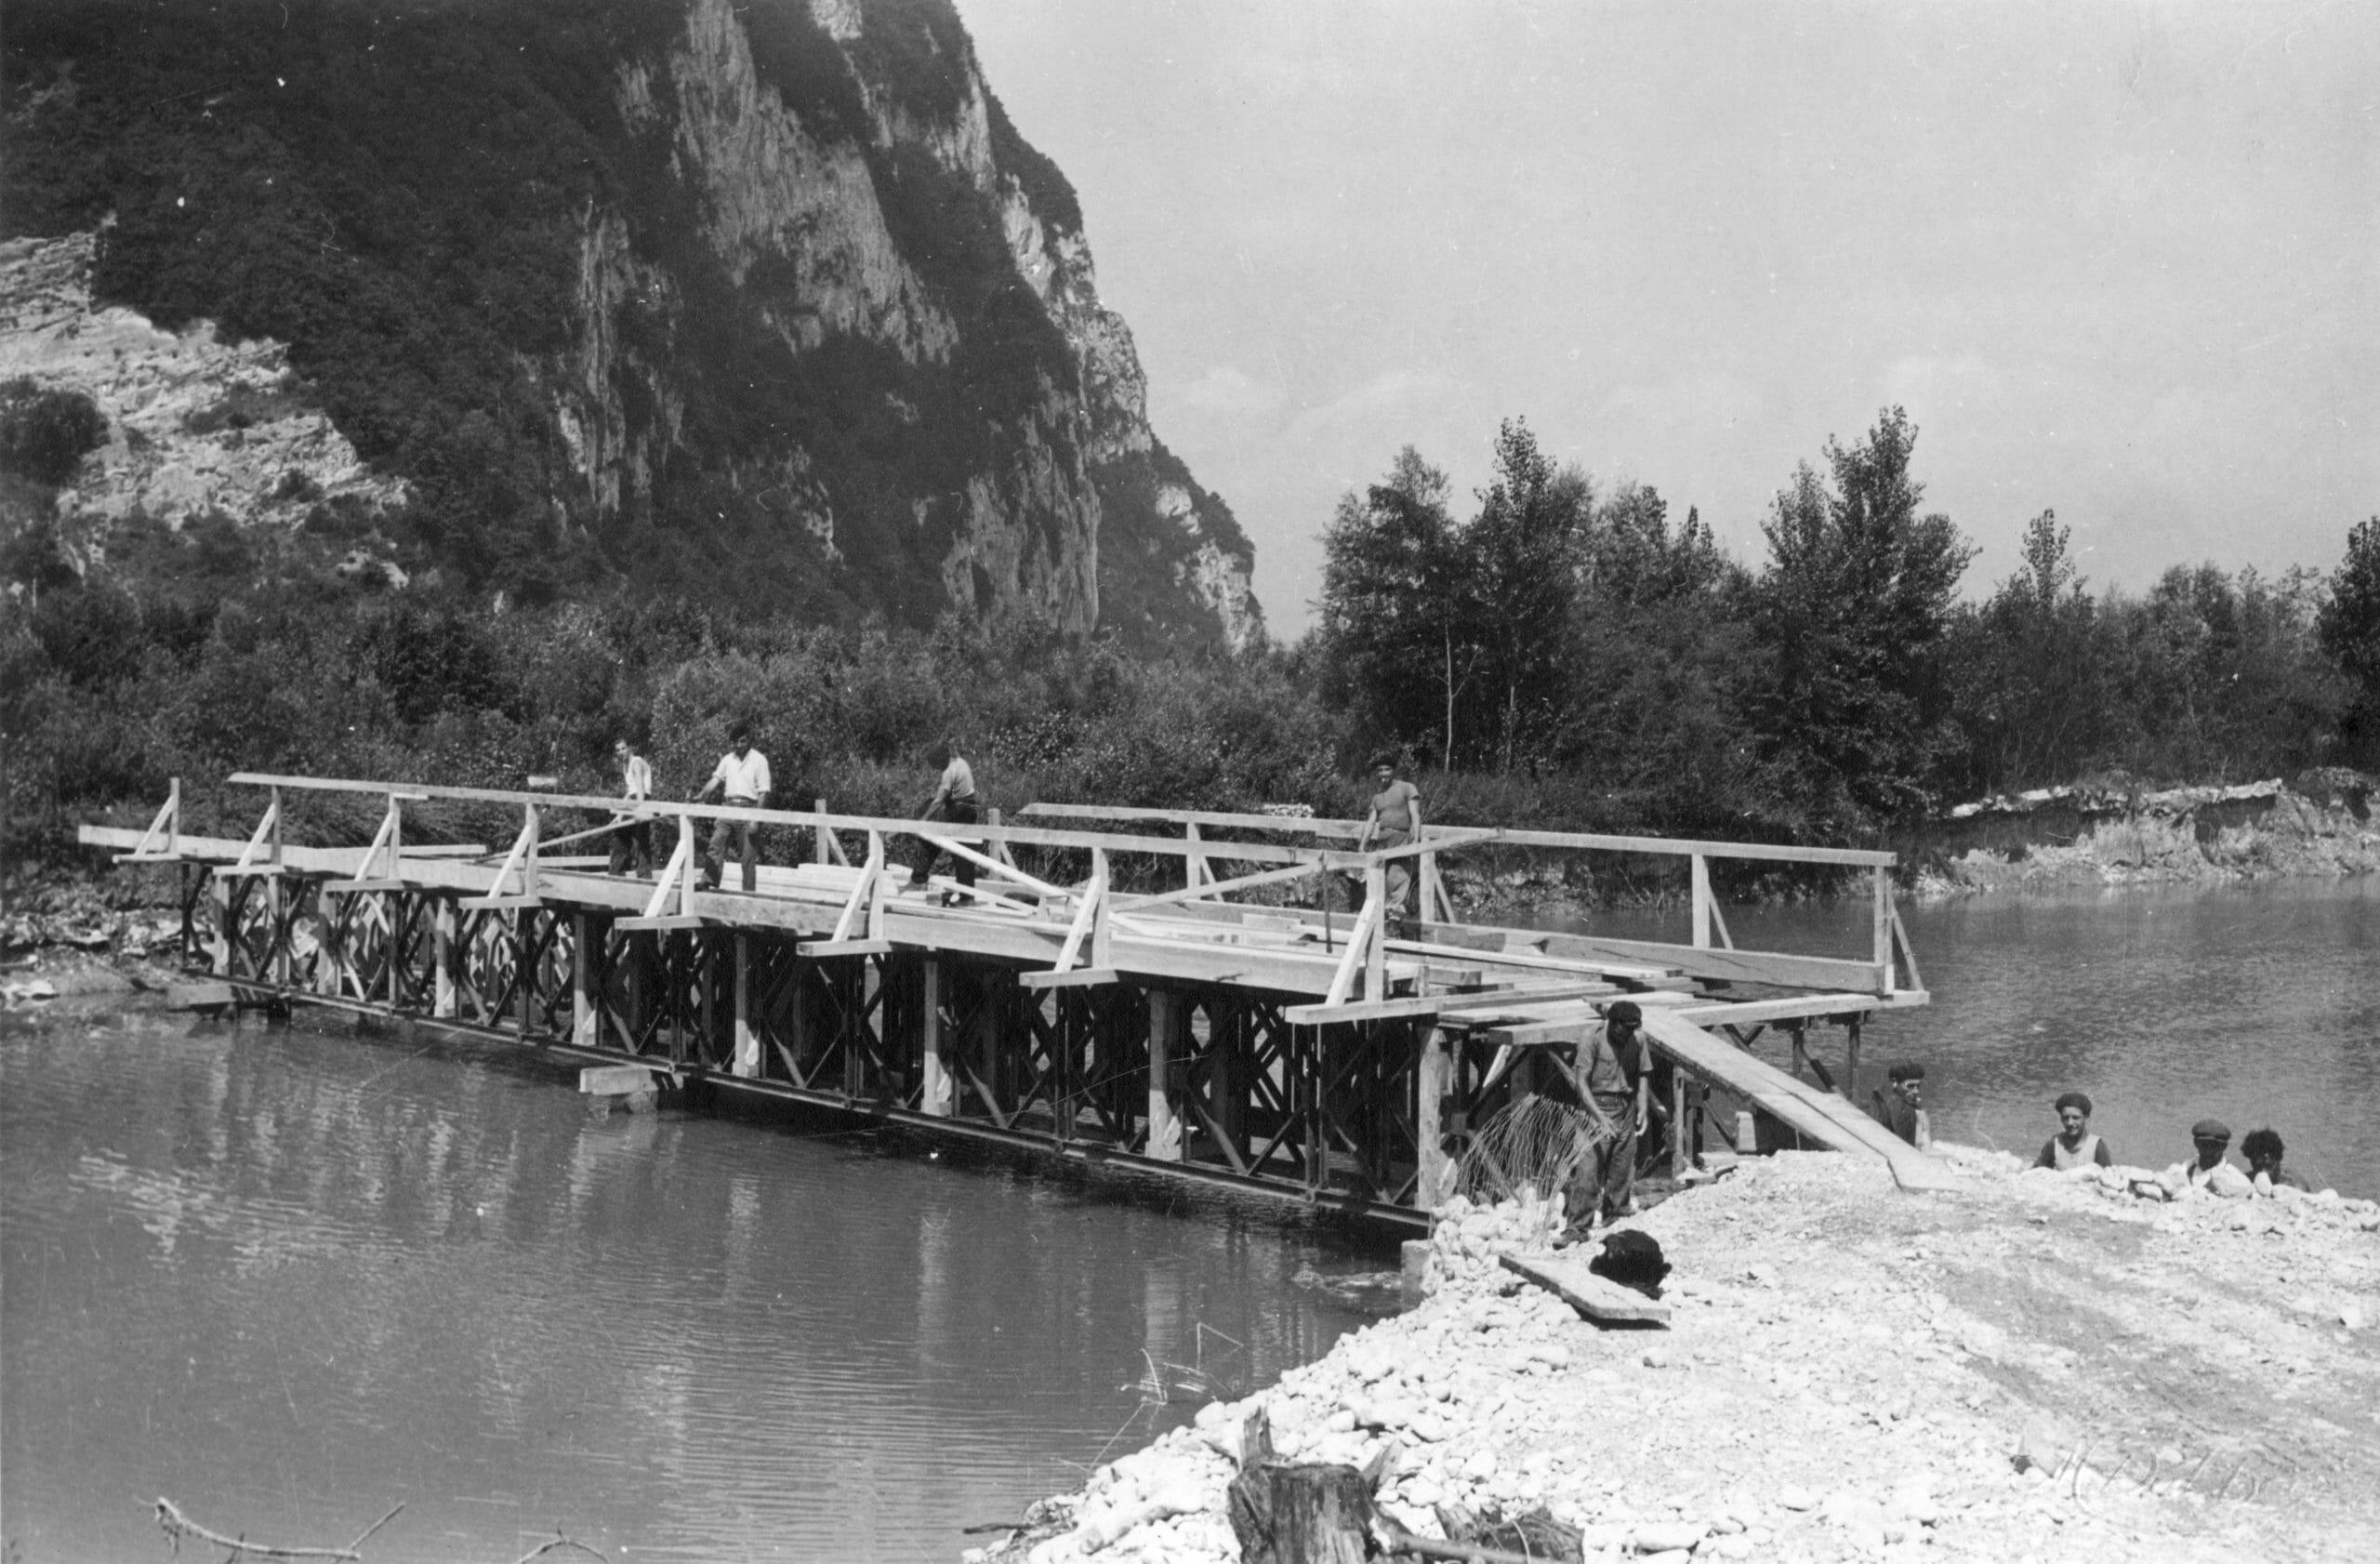 BRECHE PALLUEL TRAVAUX 5 CRUE JUIN 1948 IMAGE VAL BON